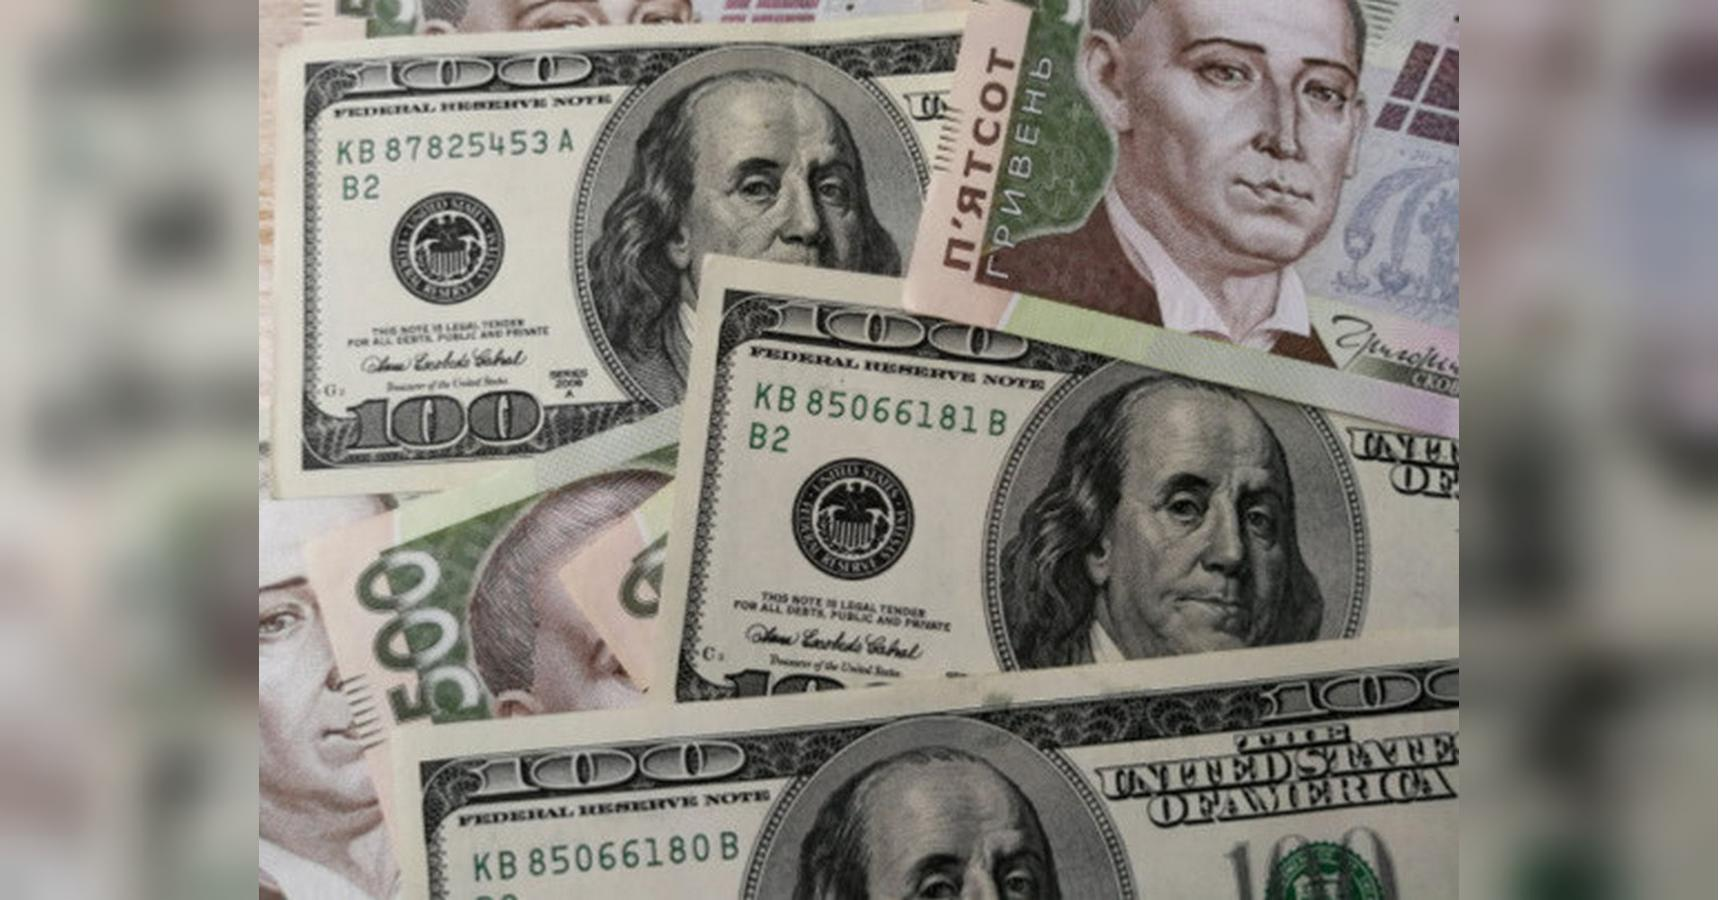 Курс доллара в Украине: J.P. Morgan дал прогноз на конец 2020 года